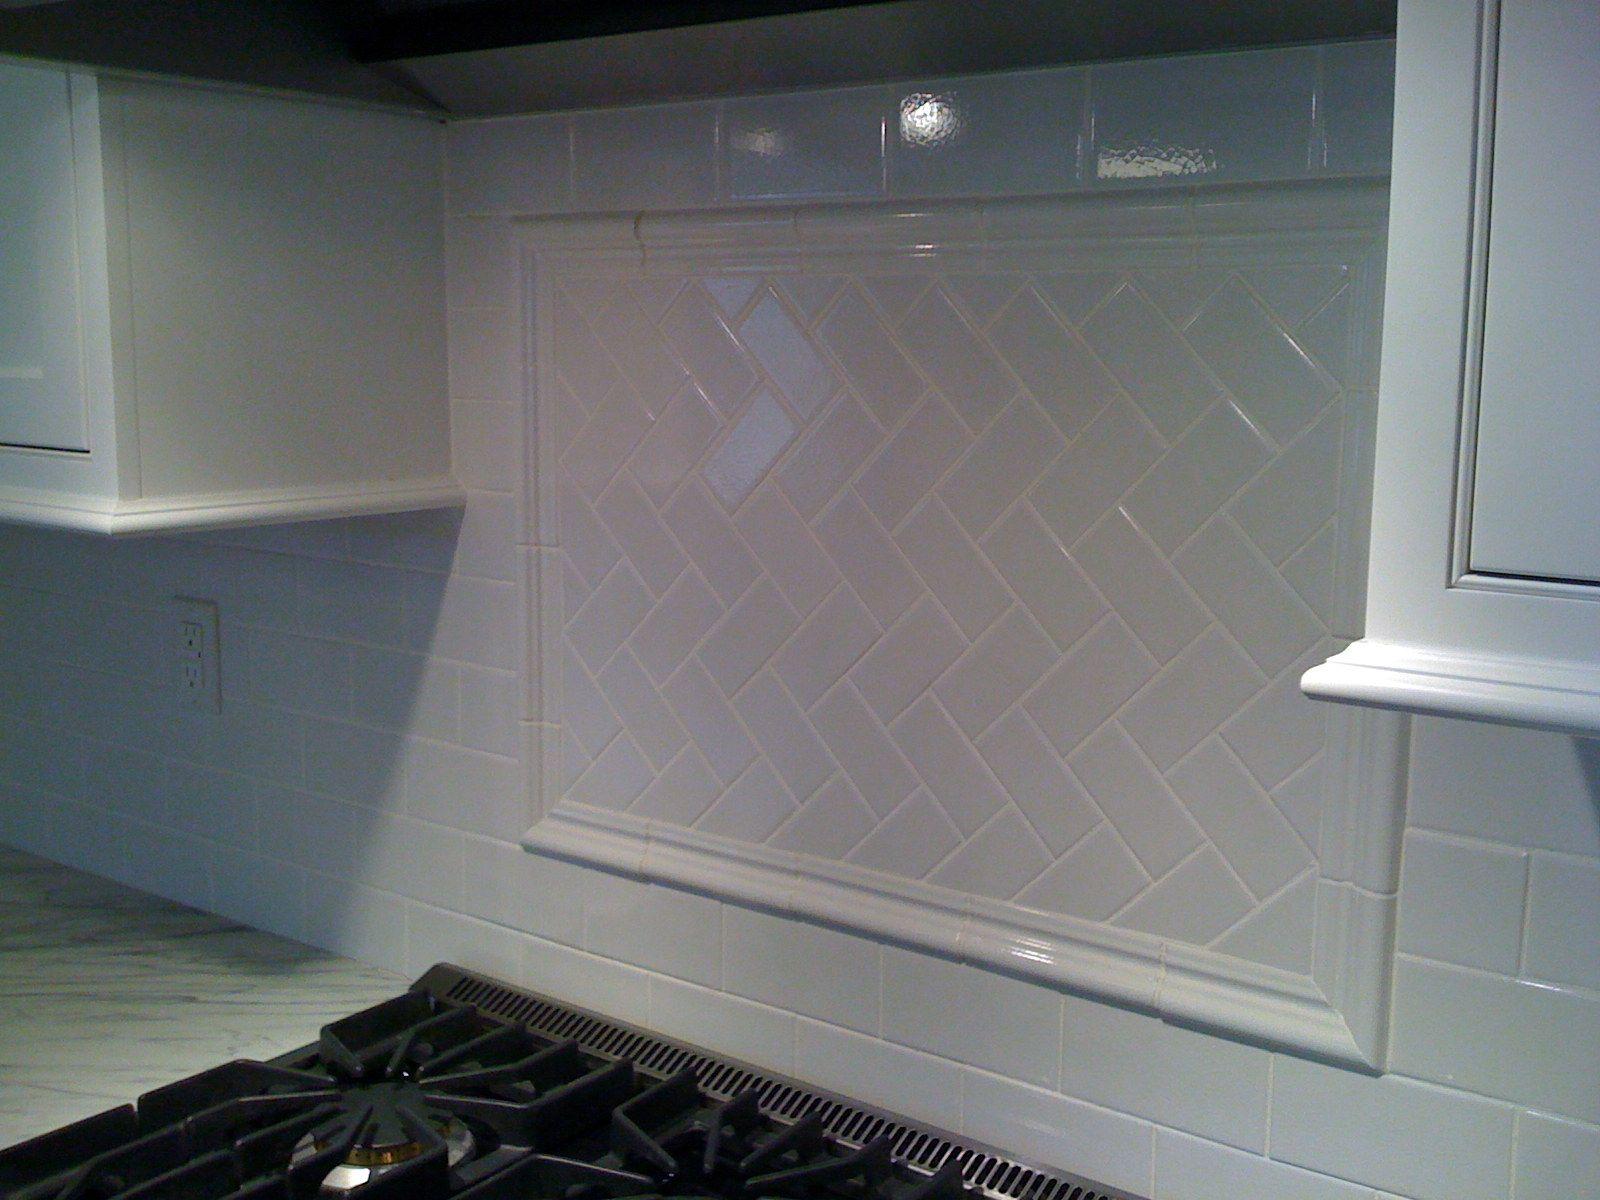 Msi Portico Herringbone 1 X 3 Ceramic Mosaic Tile In Pearl Beige Wayfair Ceramic Mosaic Tile Herringbone Backsplash Kitchen Beige Backsplash